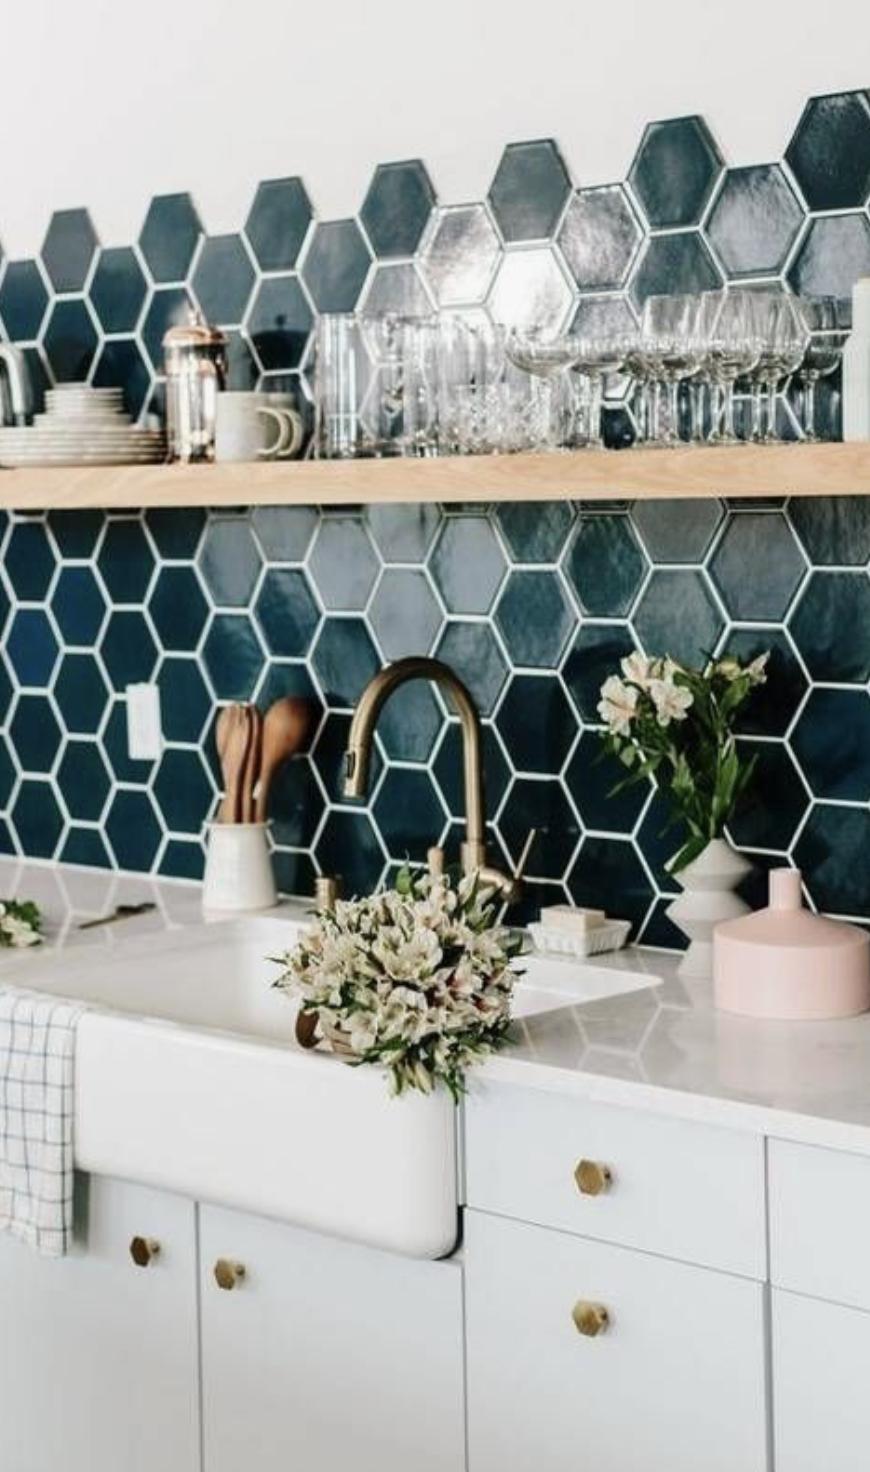 - Mermaid Tile Inspiration Kitchen Backsplash Ideas White